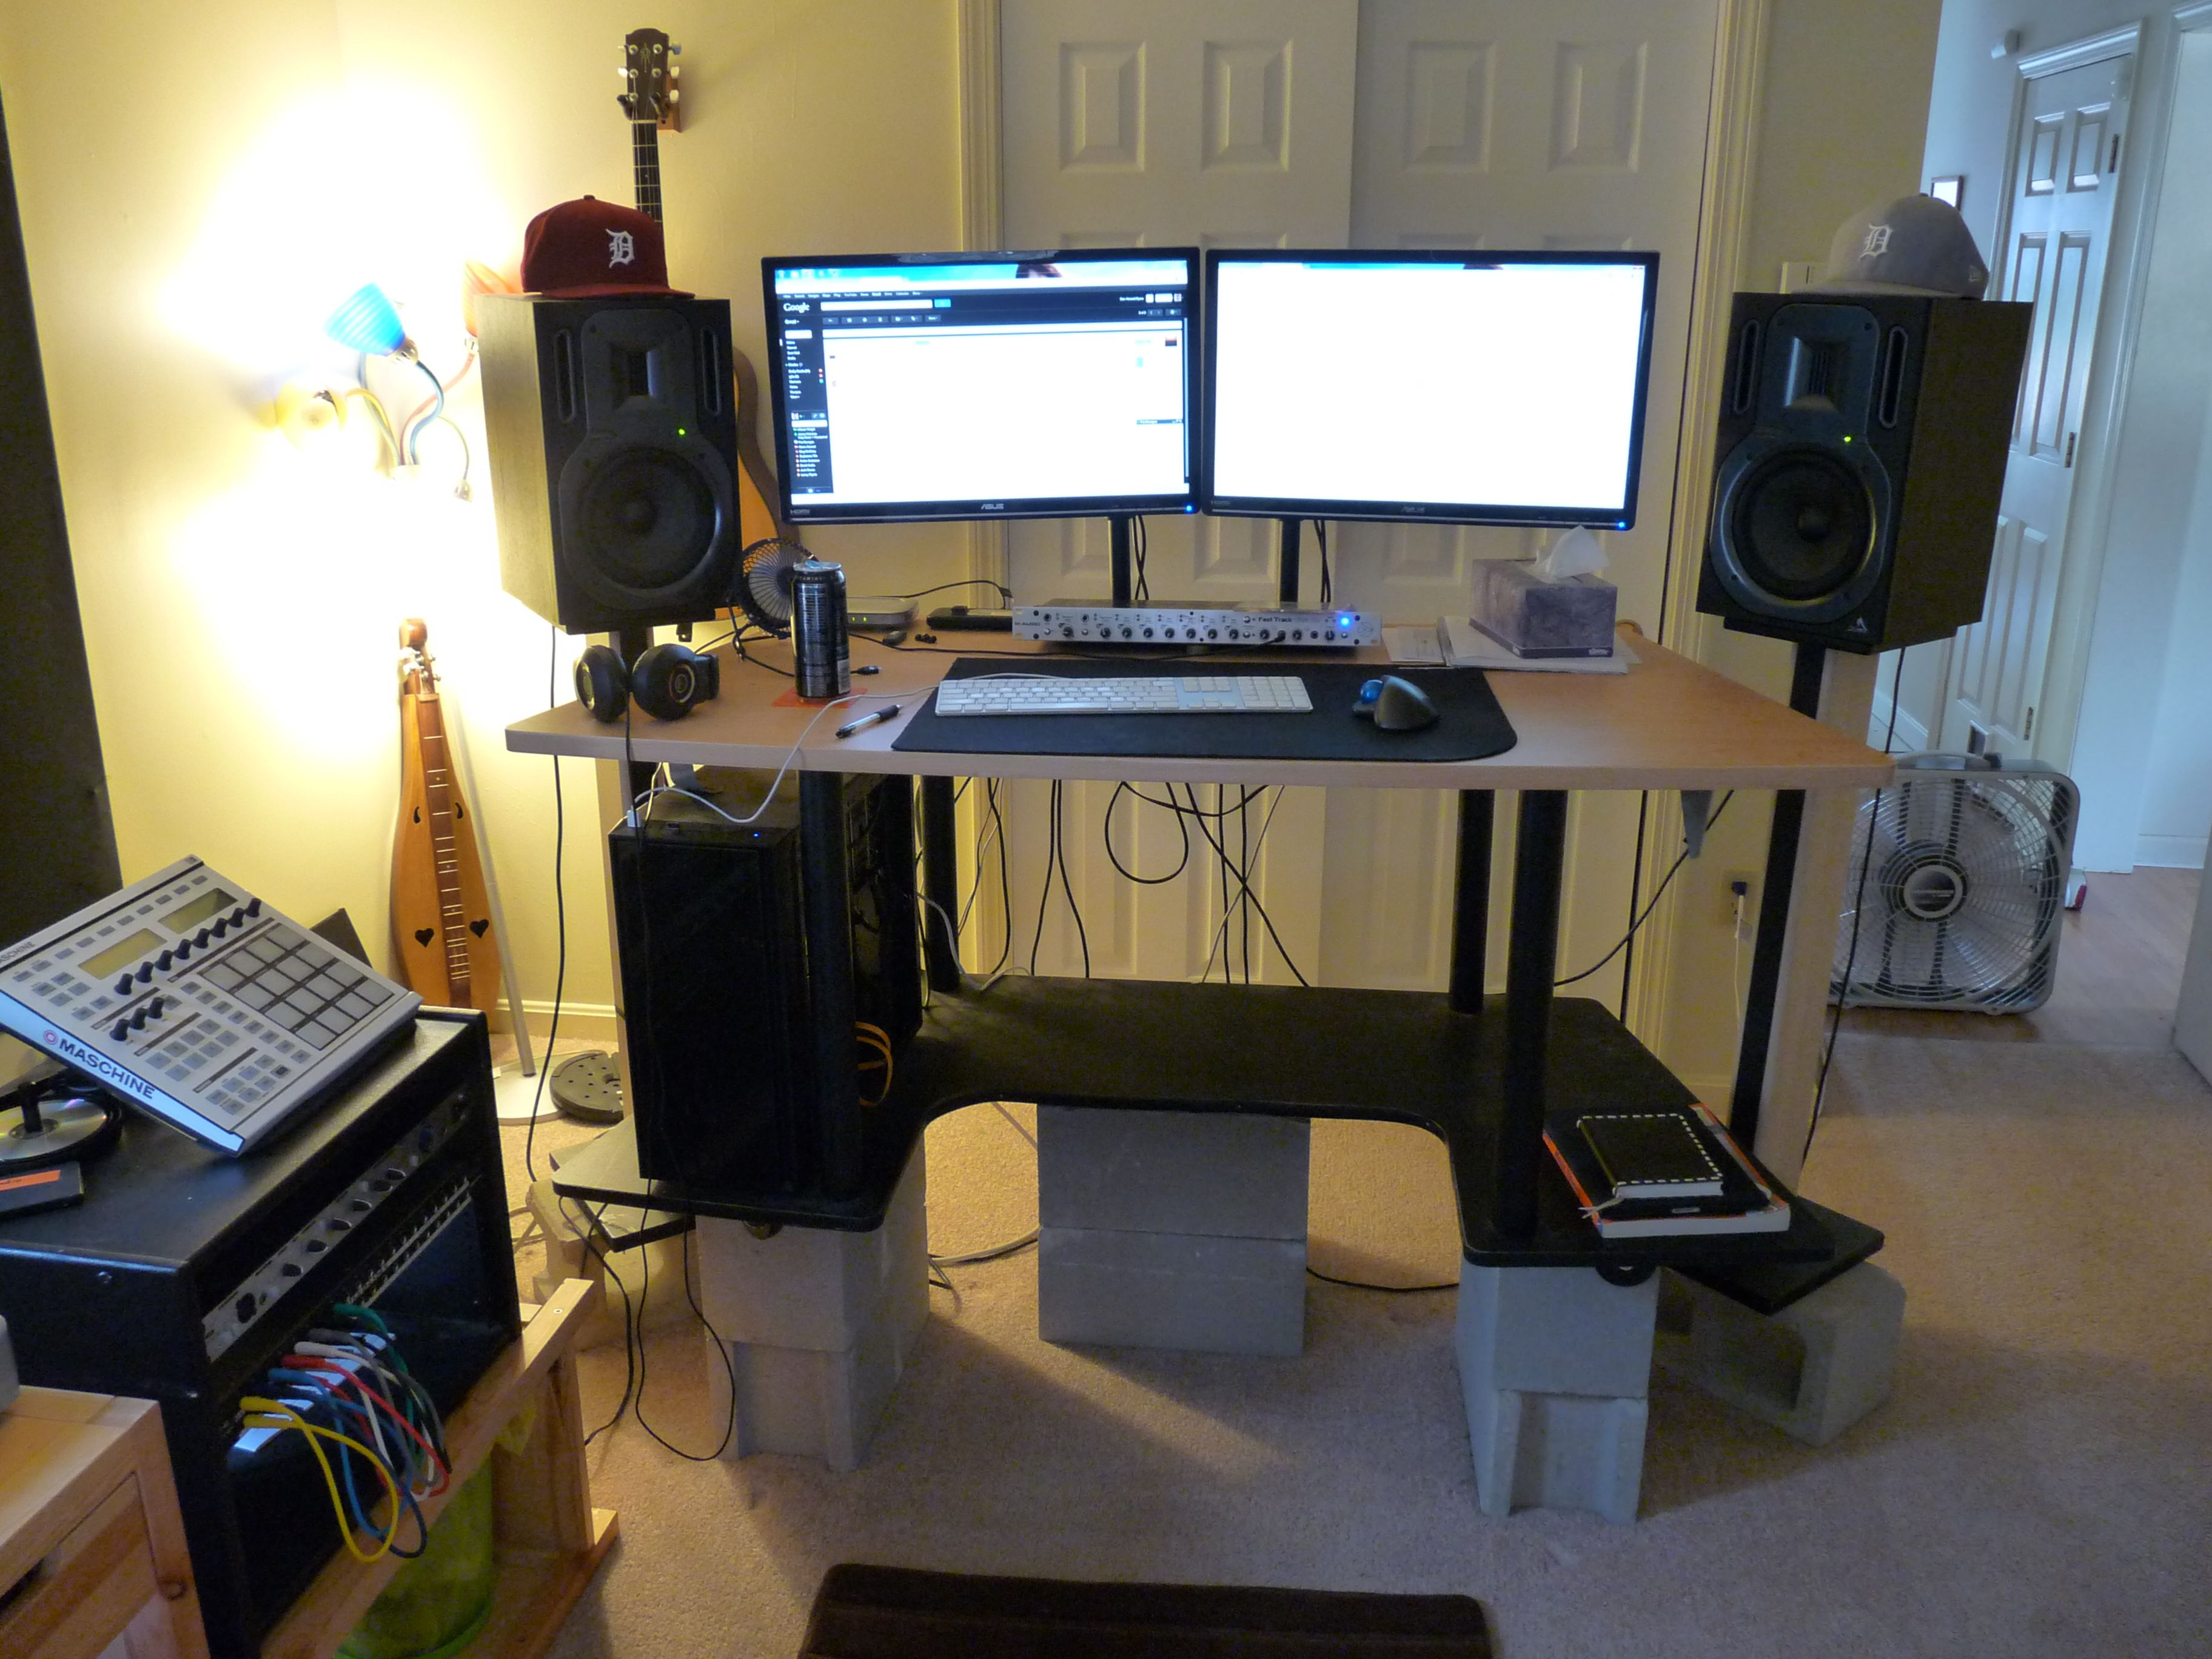 d standing desk p 3648—2736